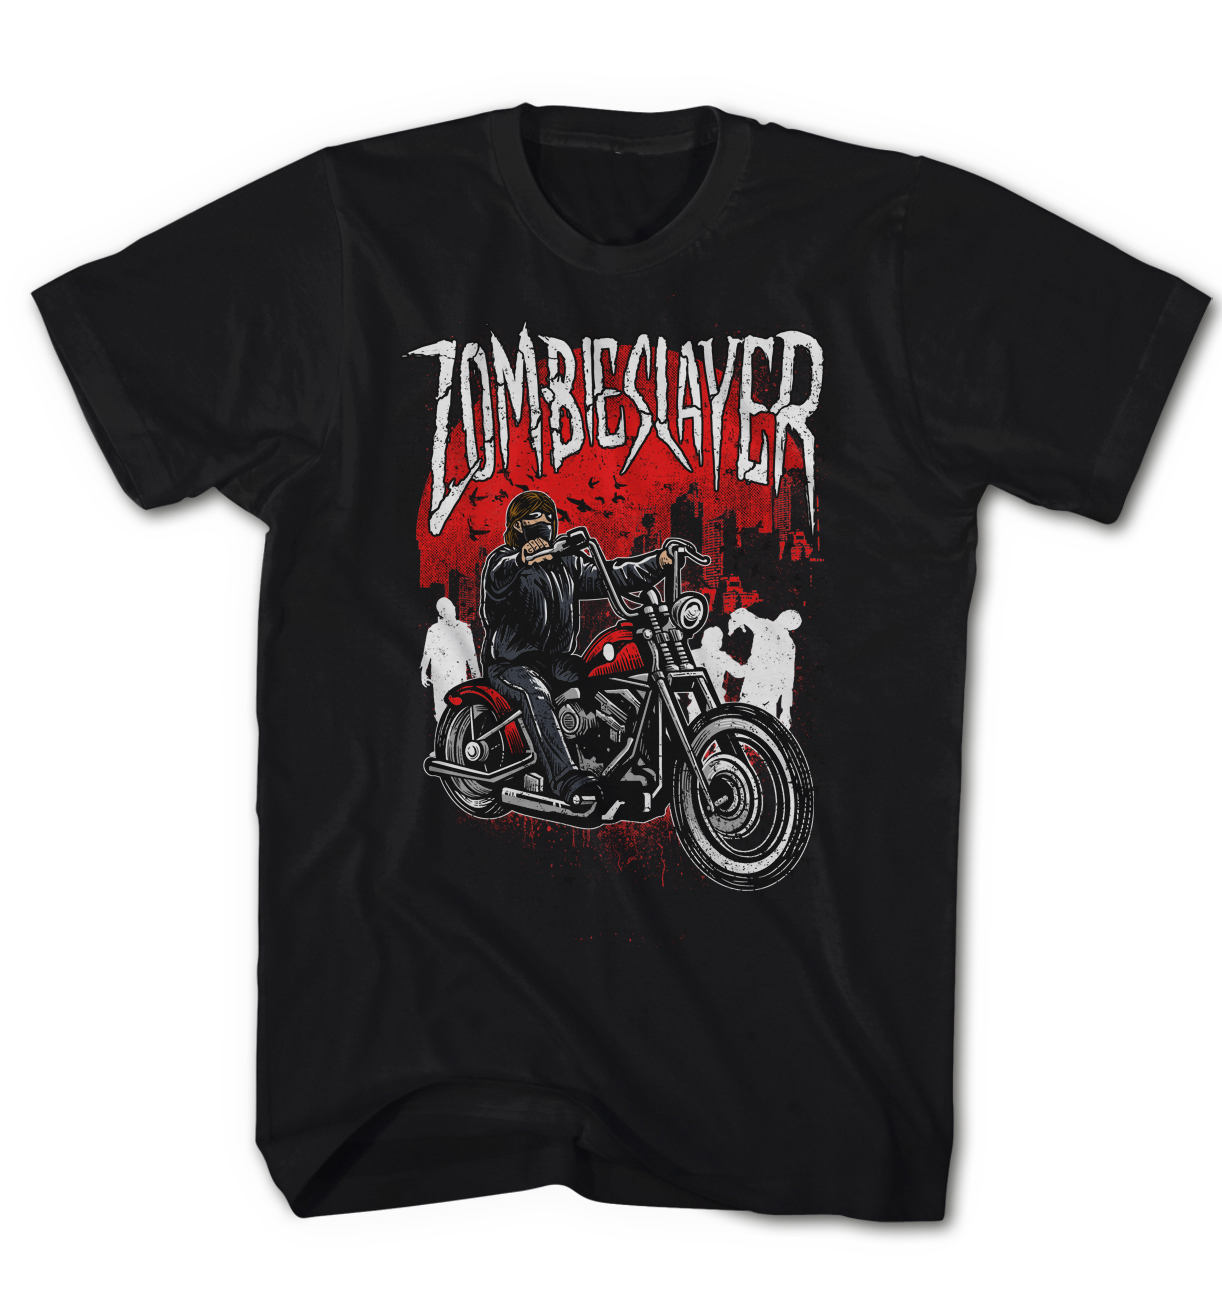 Camiseta-Hombre-Zombie-Walking-Slayer-Daryl-Redneck-Dixon-NUEVO-s-5xl-zs1116